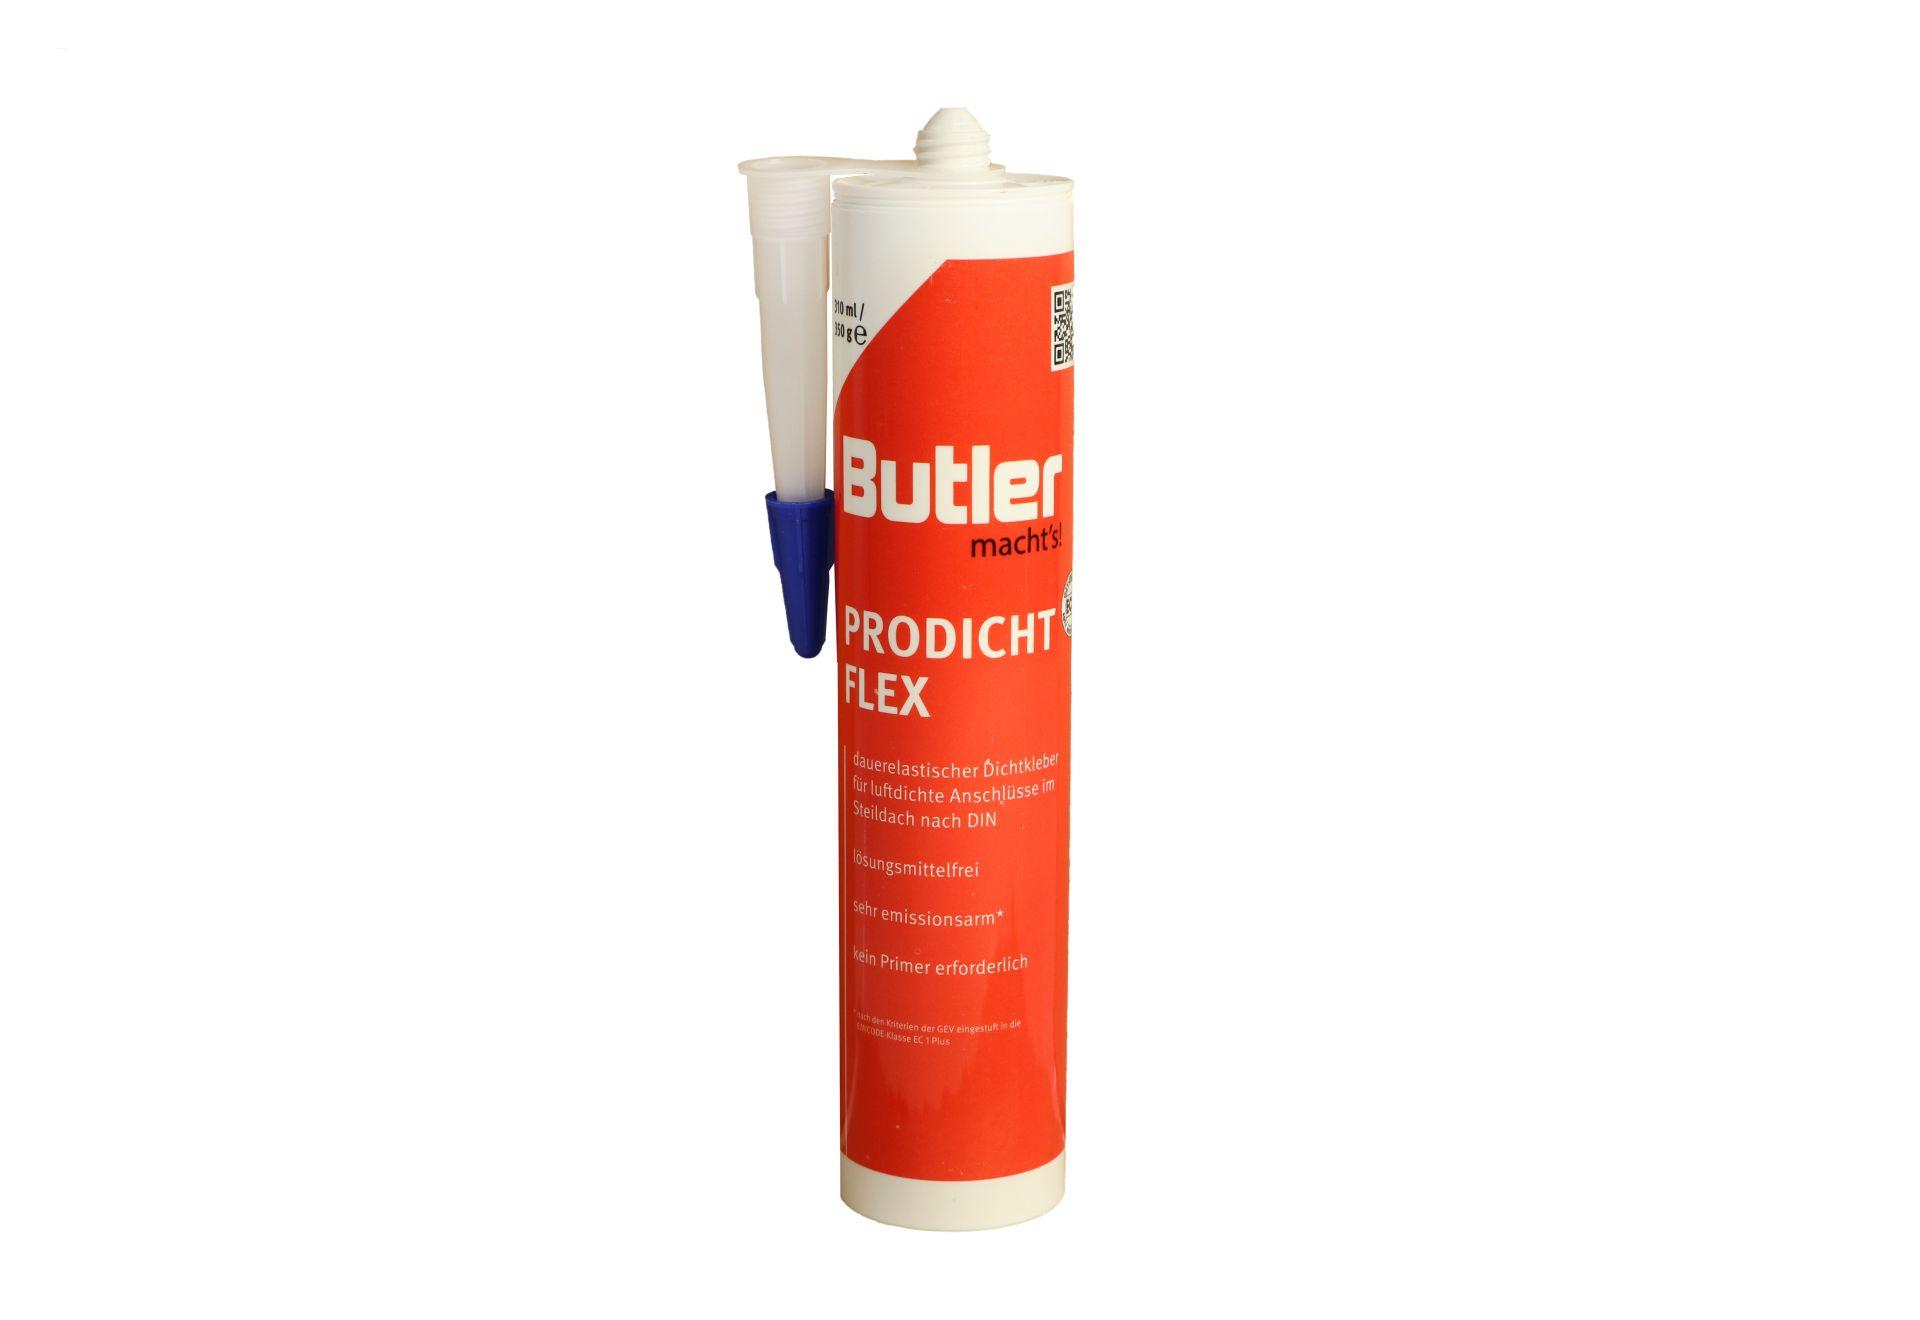 Butler macht's! ProDicht Flex, Foliendichtkleber, 310 ml